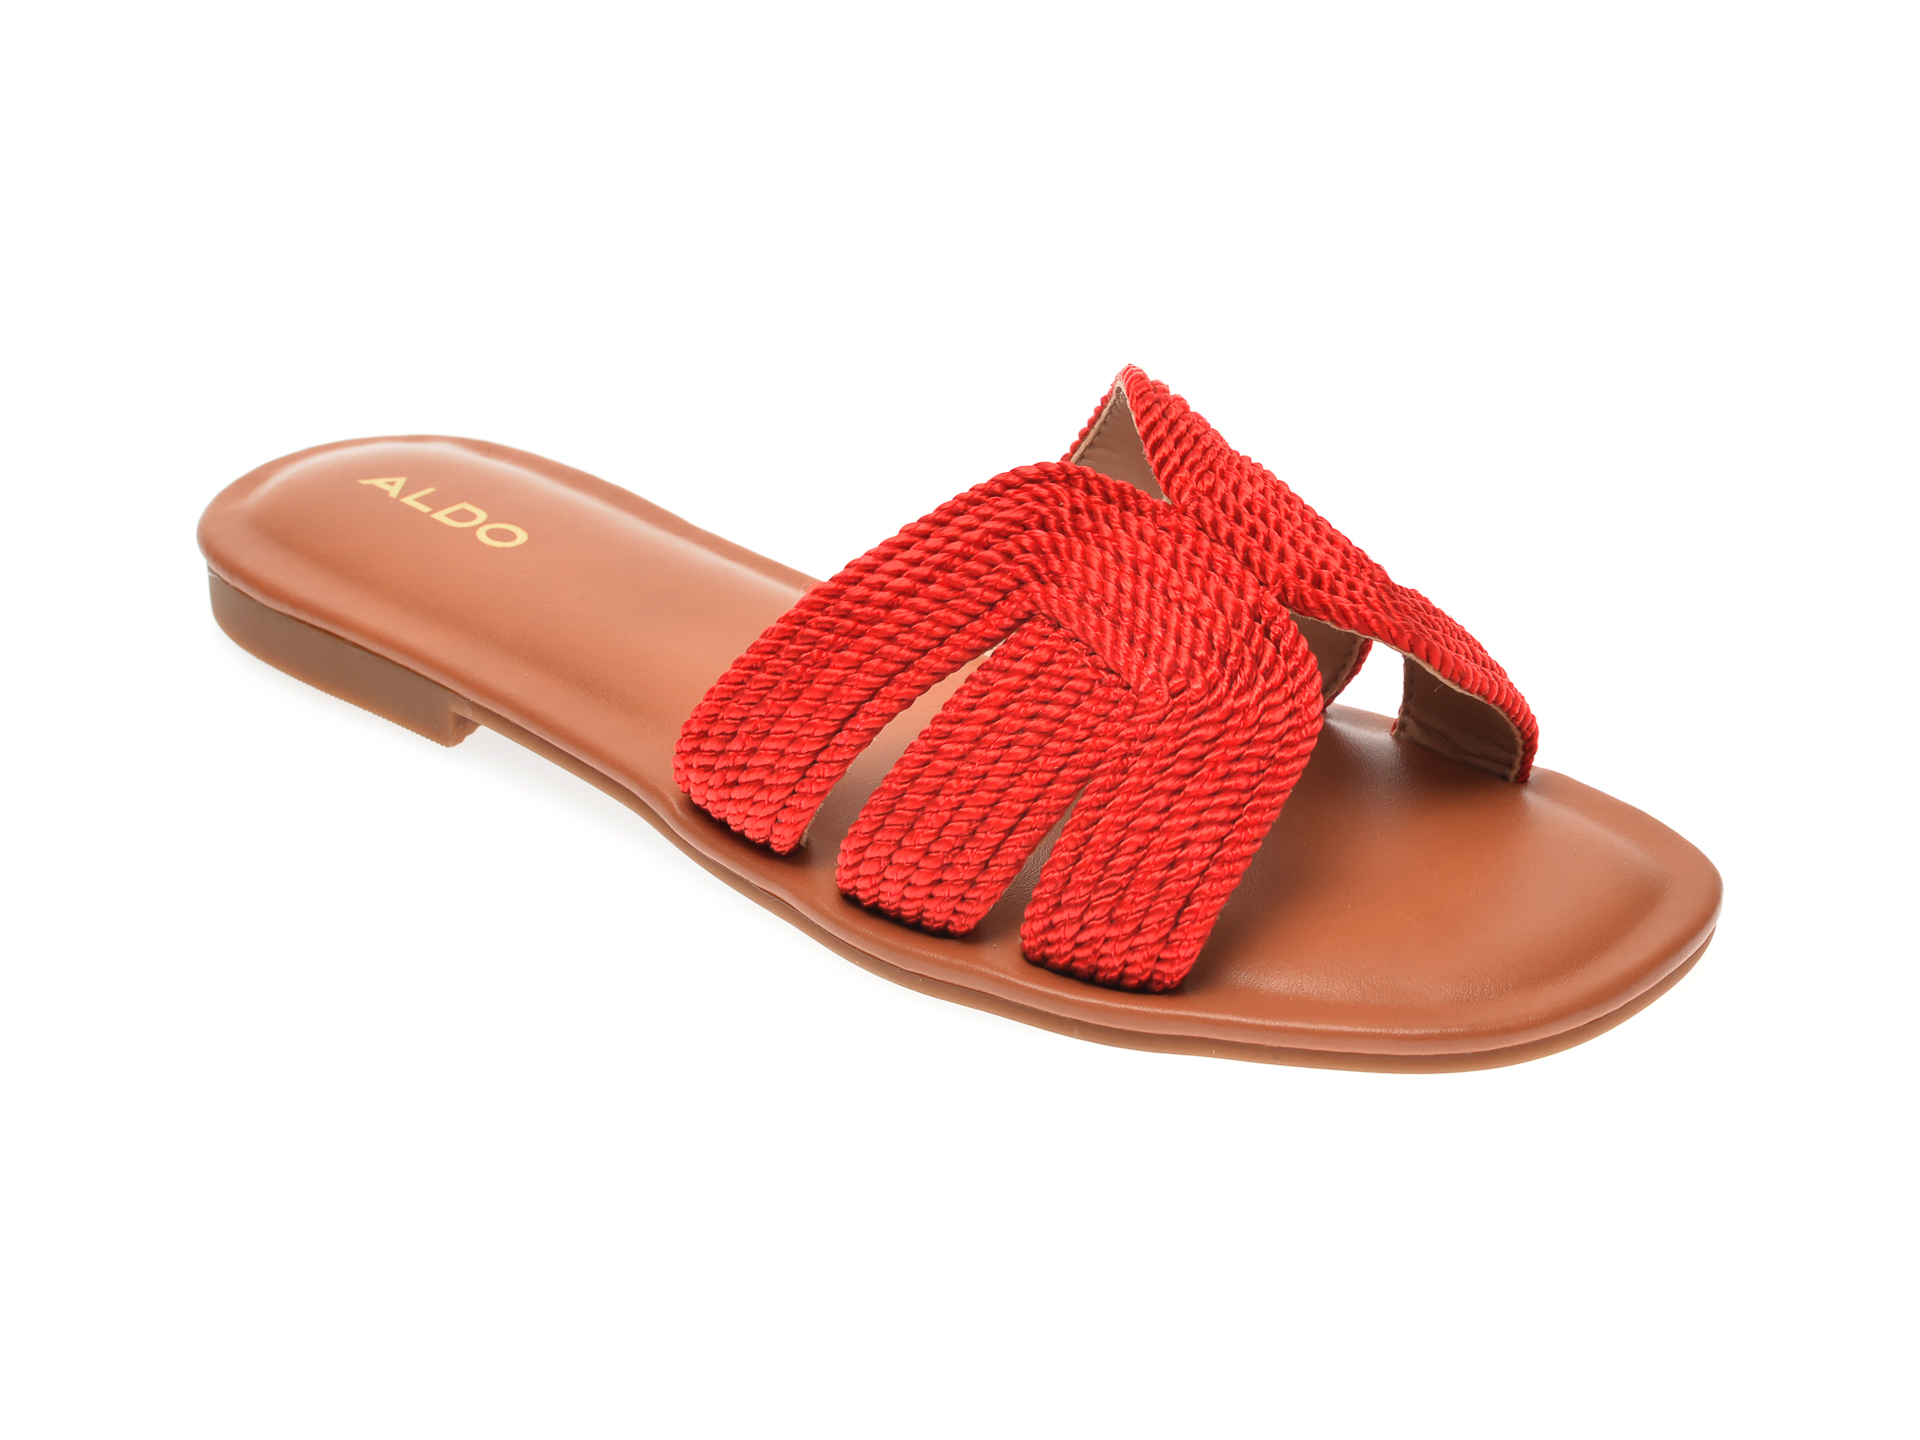 Papuci ALDO rosii, Starlight600, din material textil